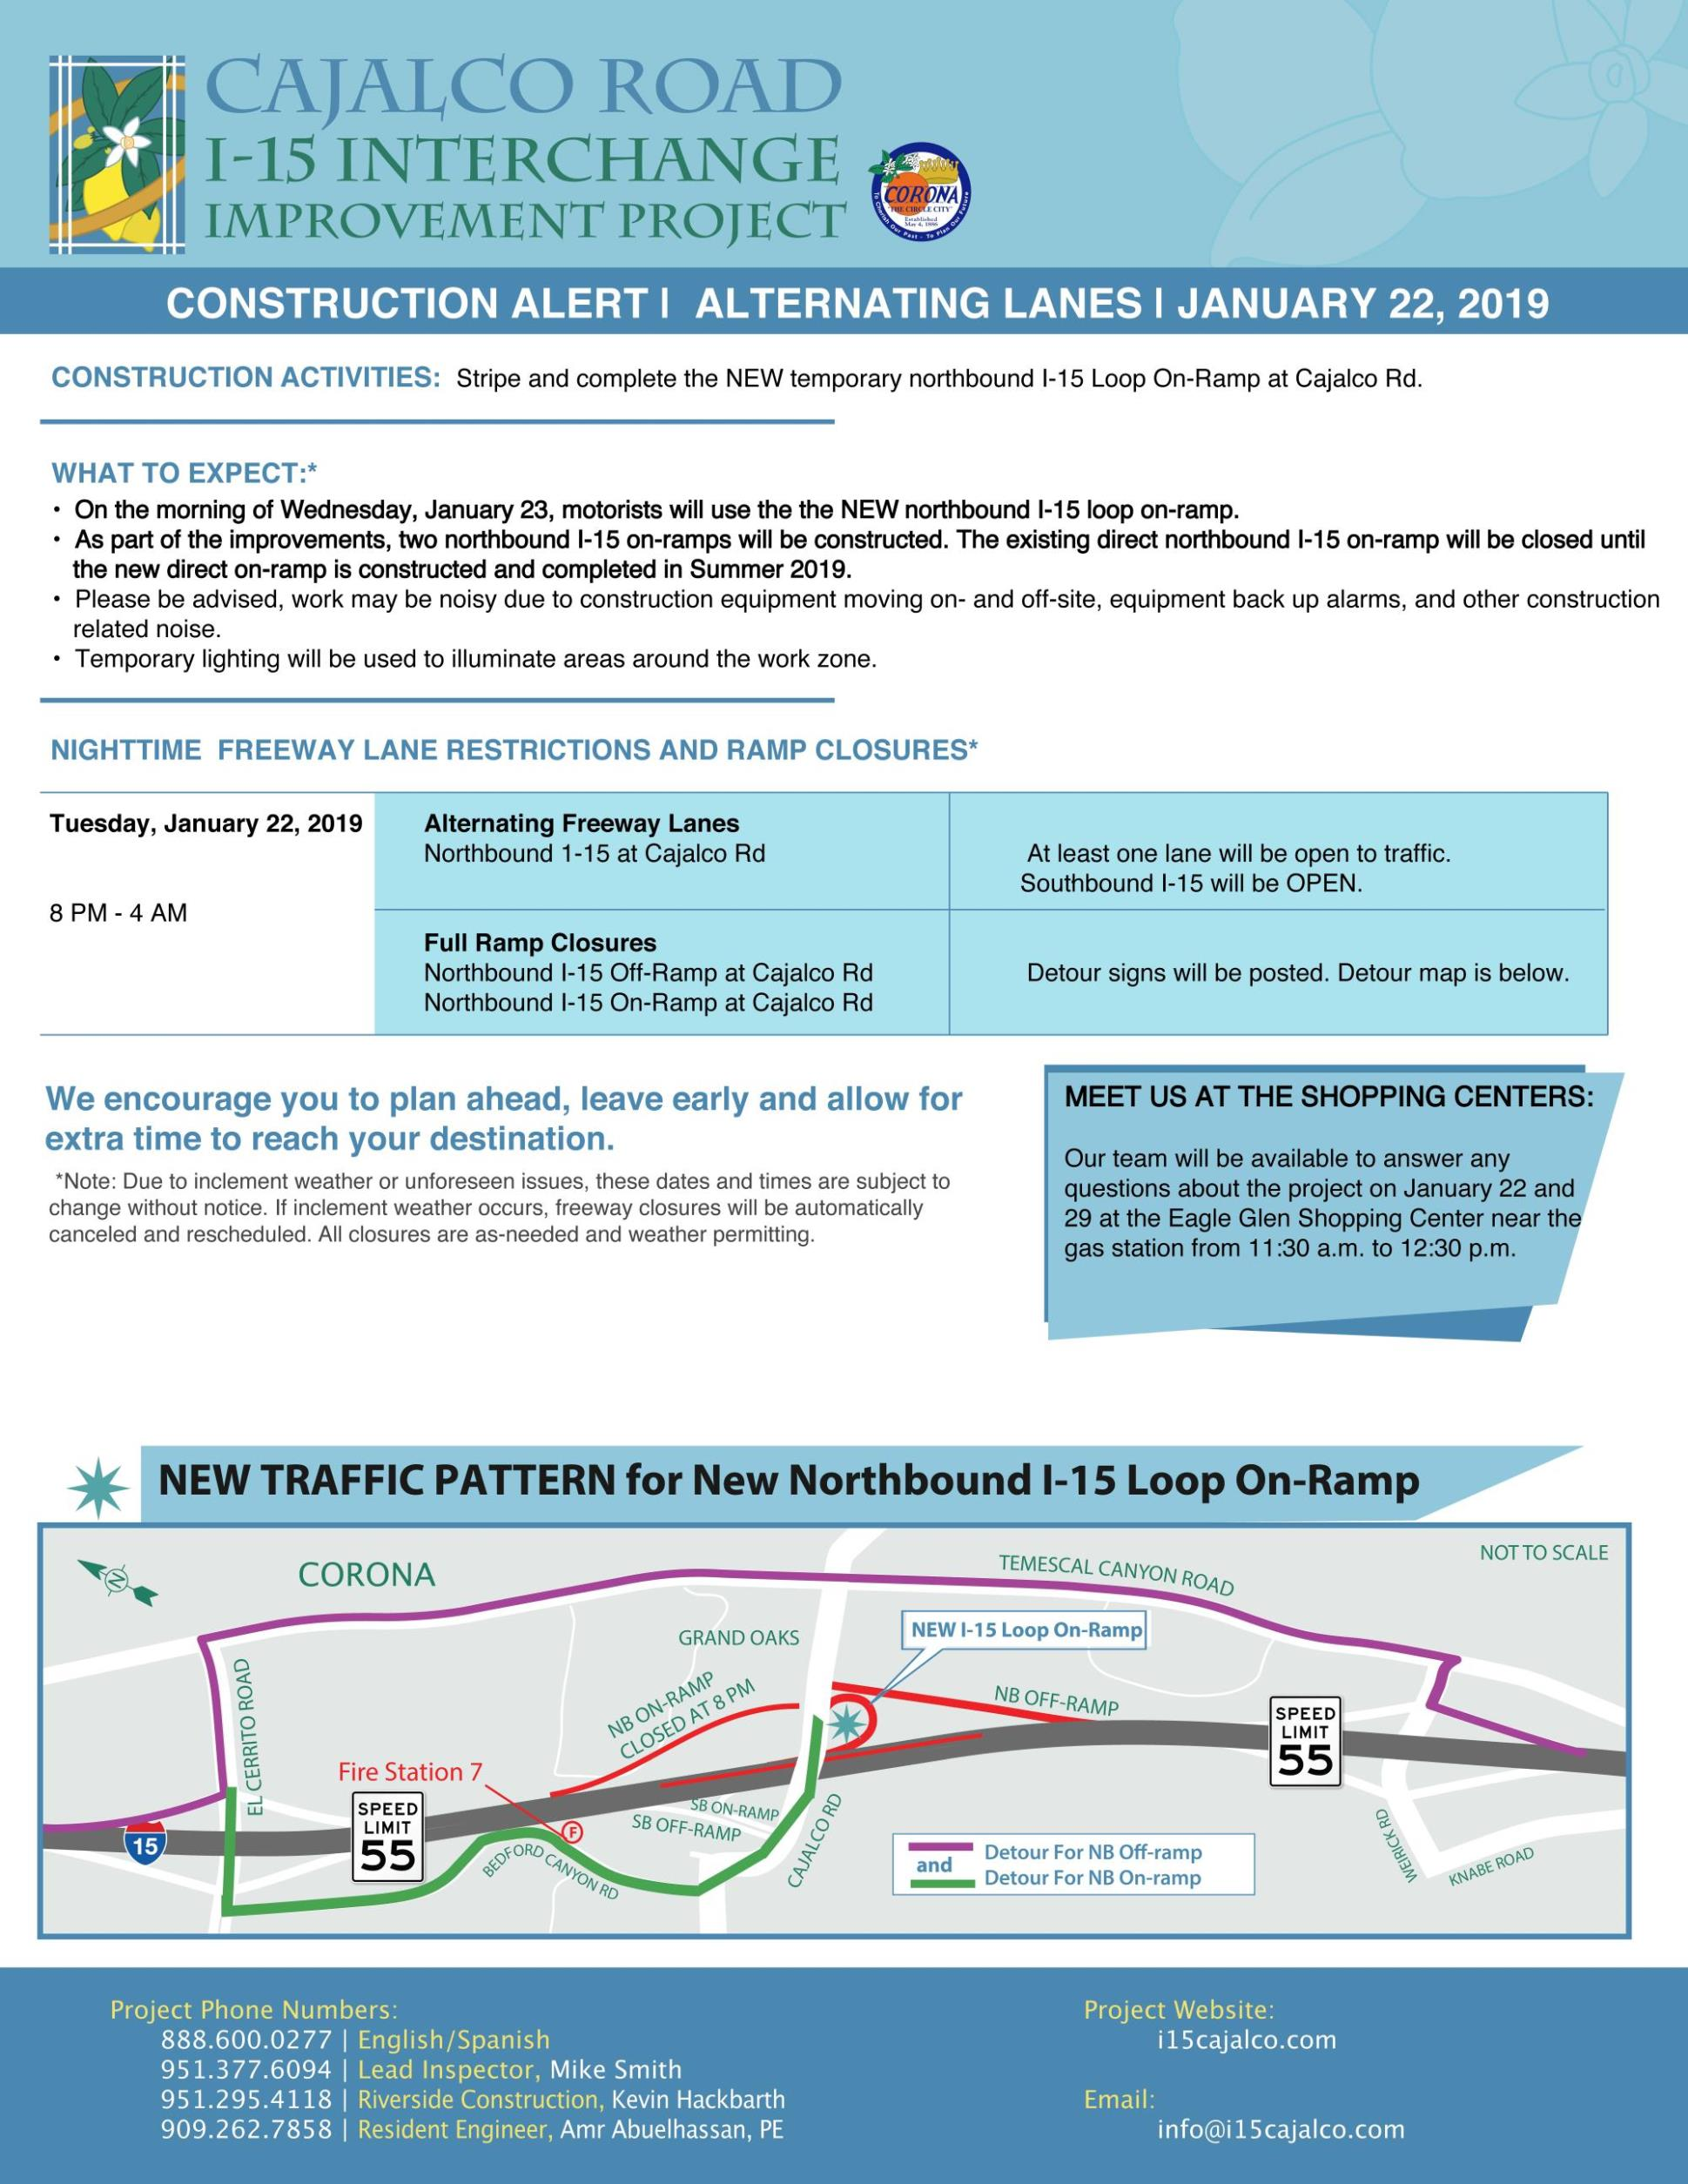 Cajalco Rd/I-15 Interchange Project Construction Alert